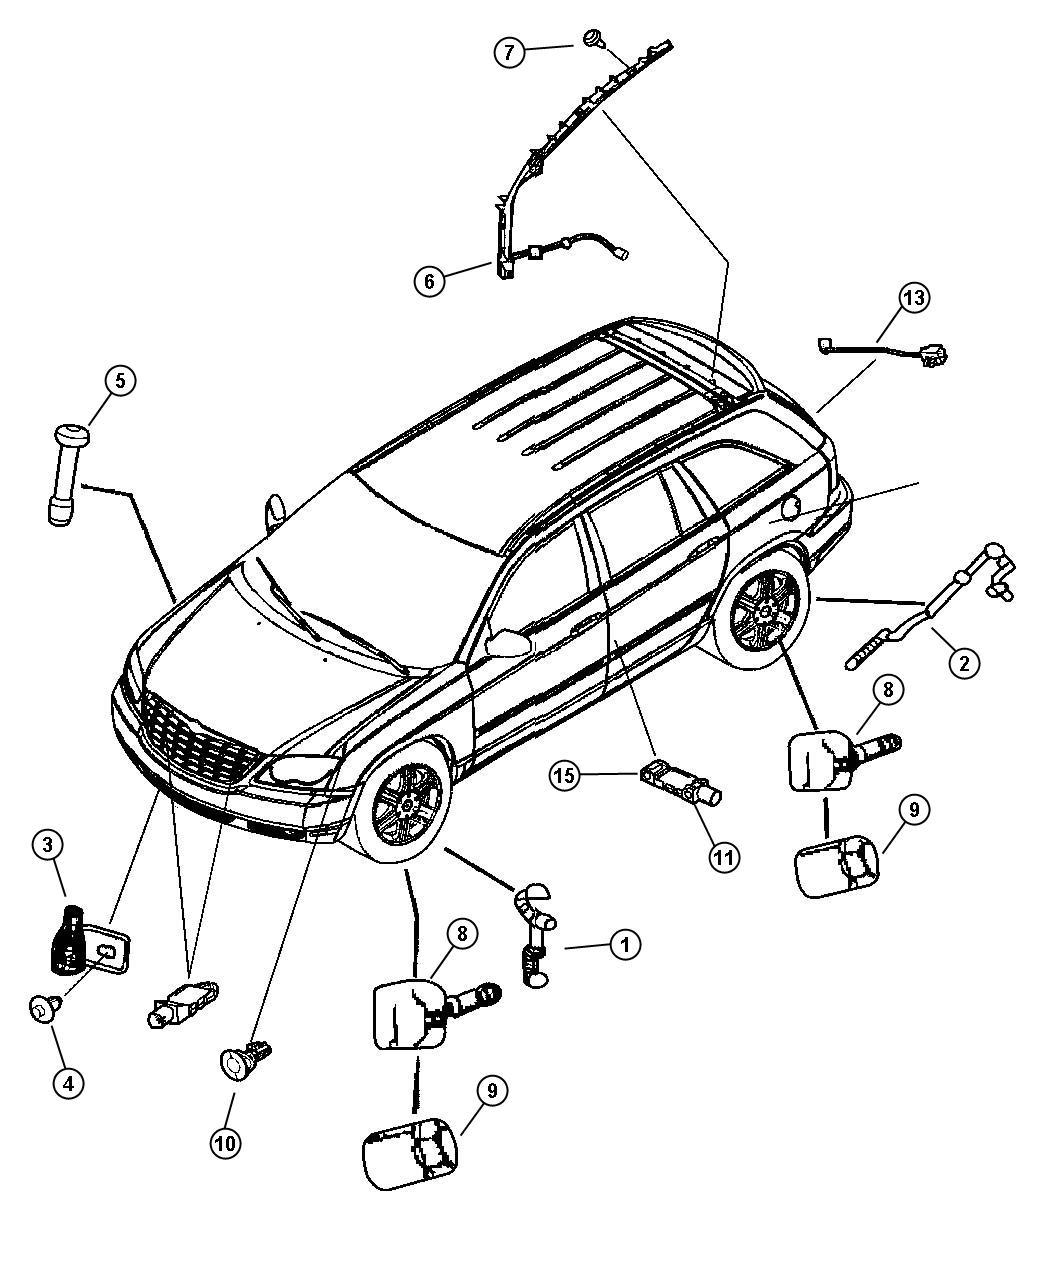 2005 Chrysler Pacifica Sensor. Air bag. Front. Hydroform